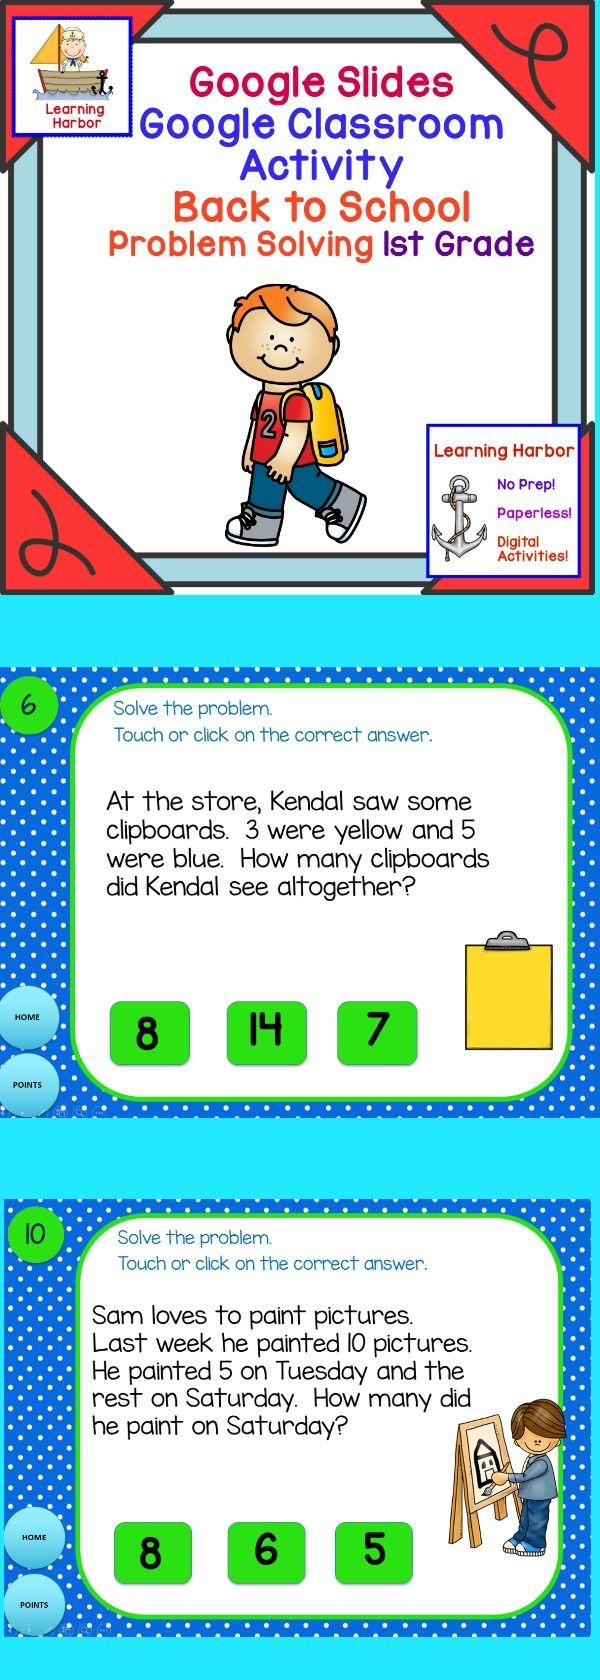 Math Problem Solving 1st Grade for Google Classroom™ Activity